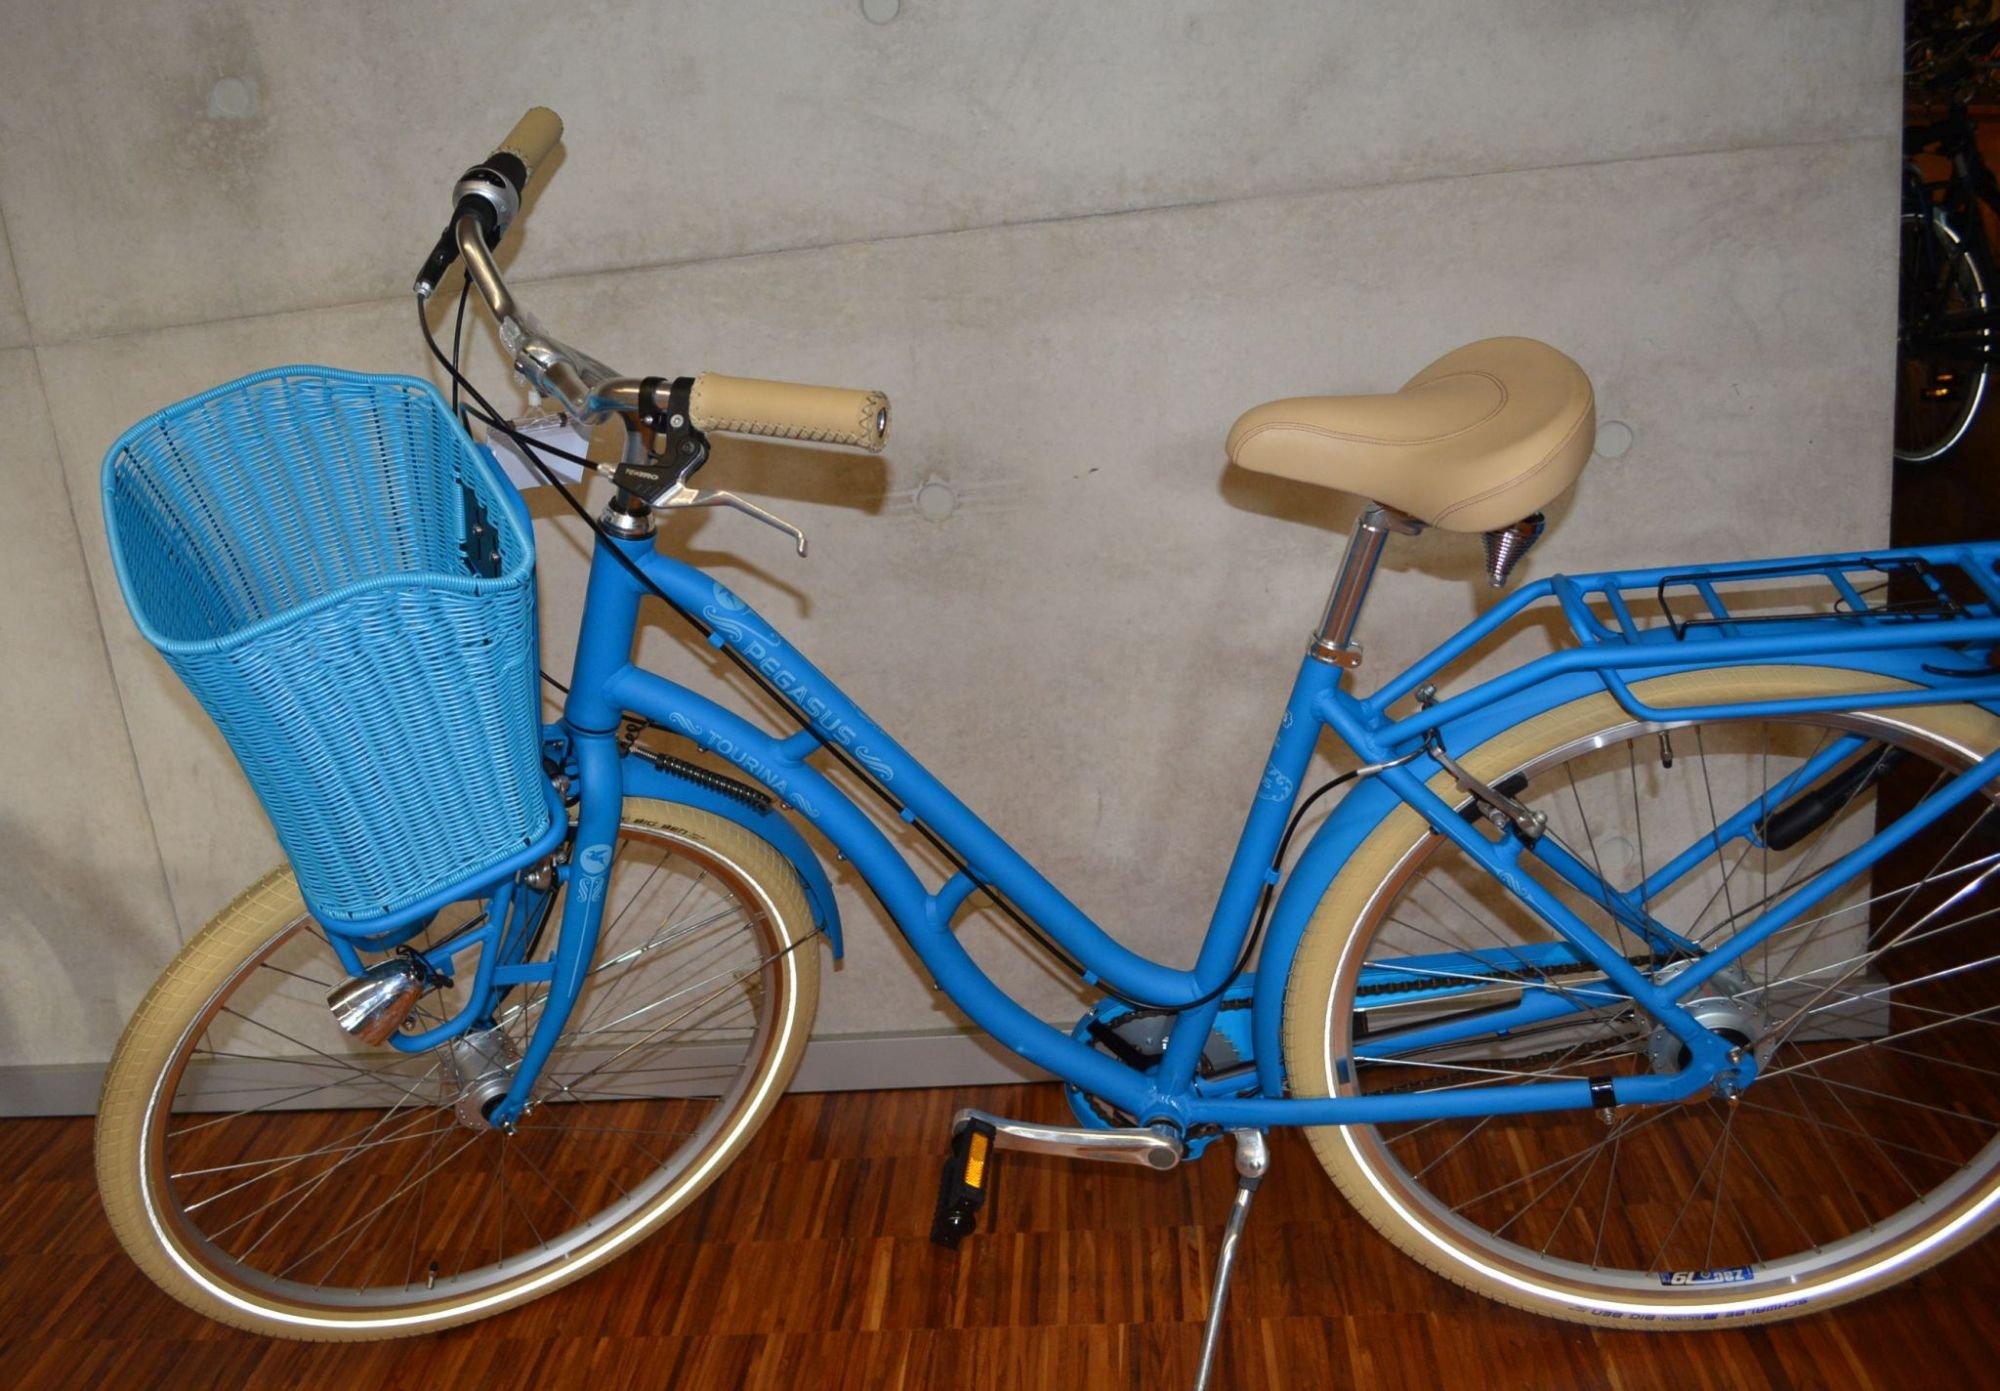 Standwell Vorderrad-Korb für Pegasus Tourina blau matt